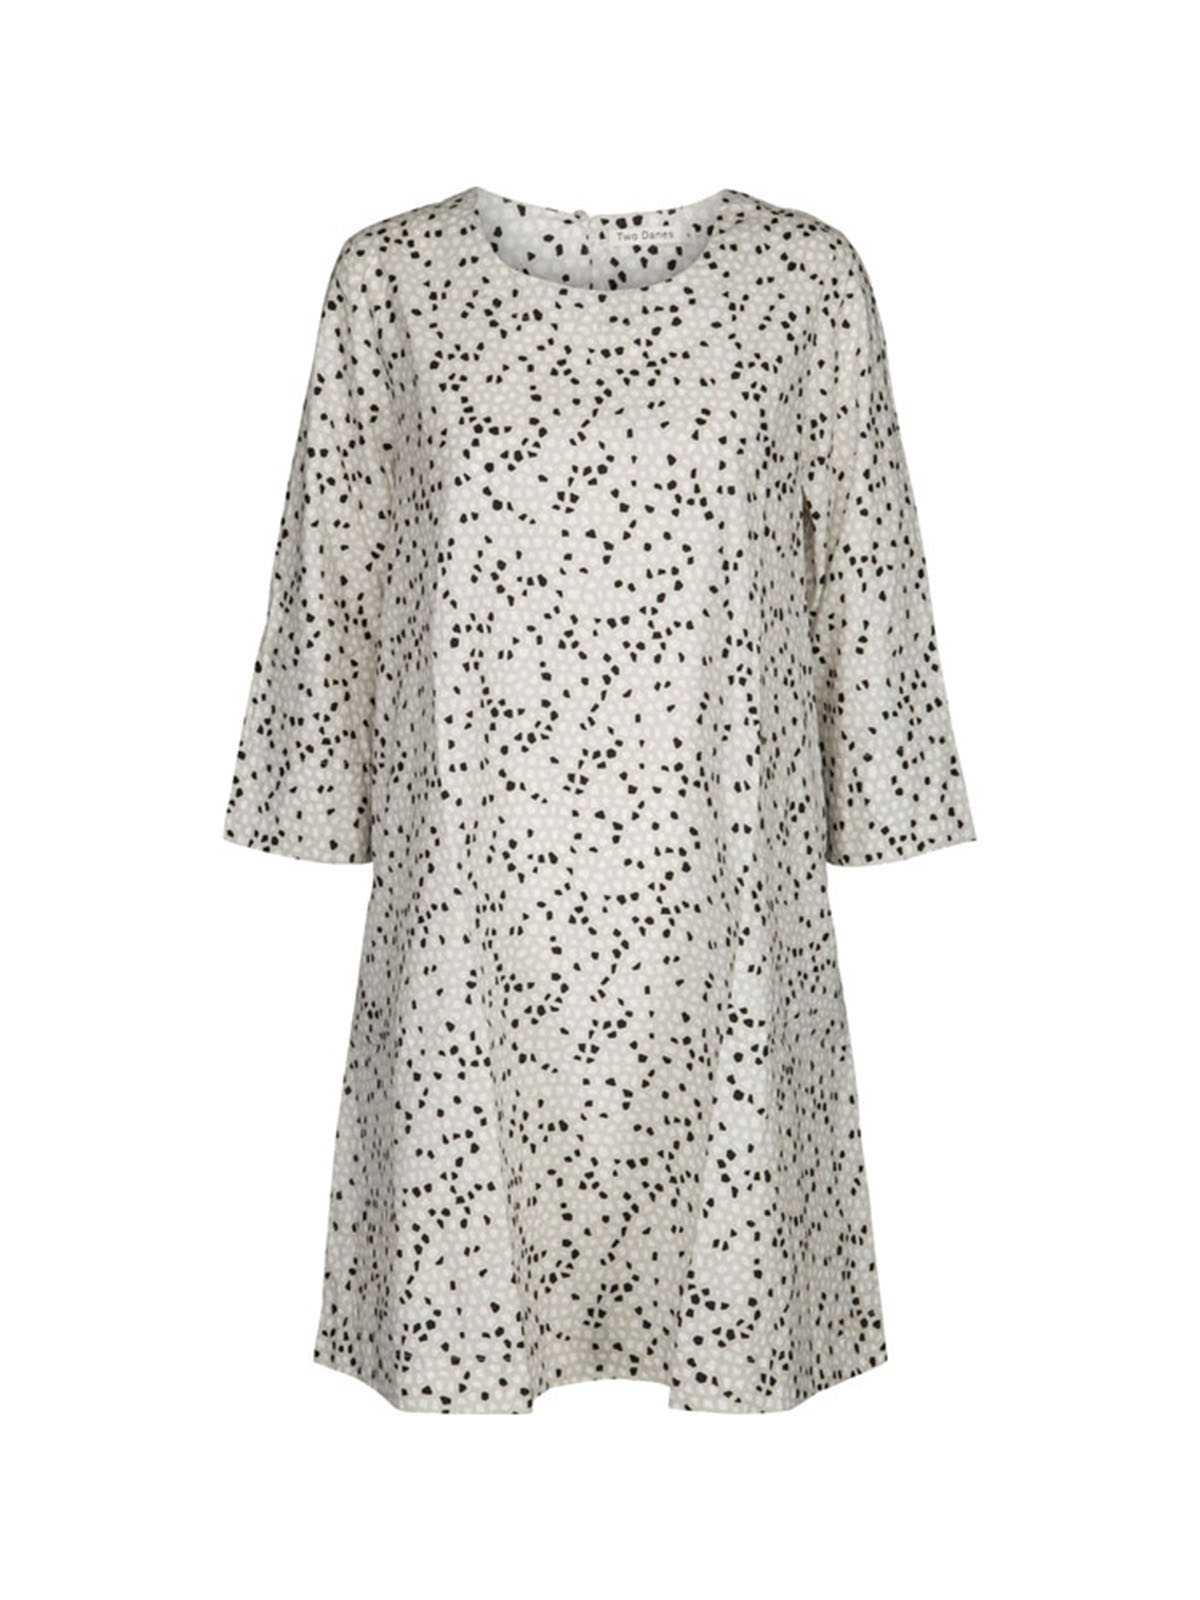 Thorid Dress Two Danes Katie Kerr Women's Clothing